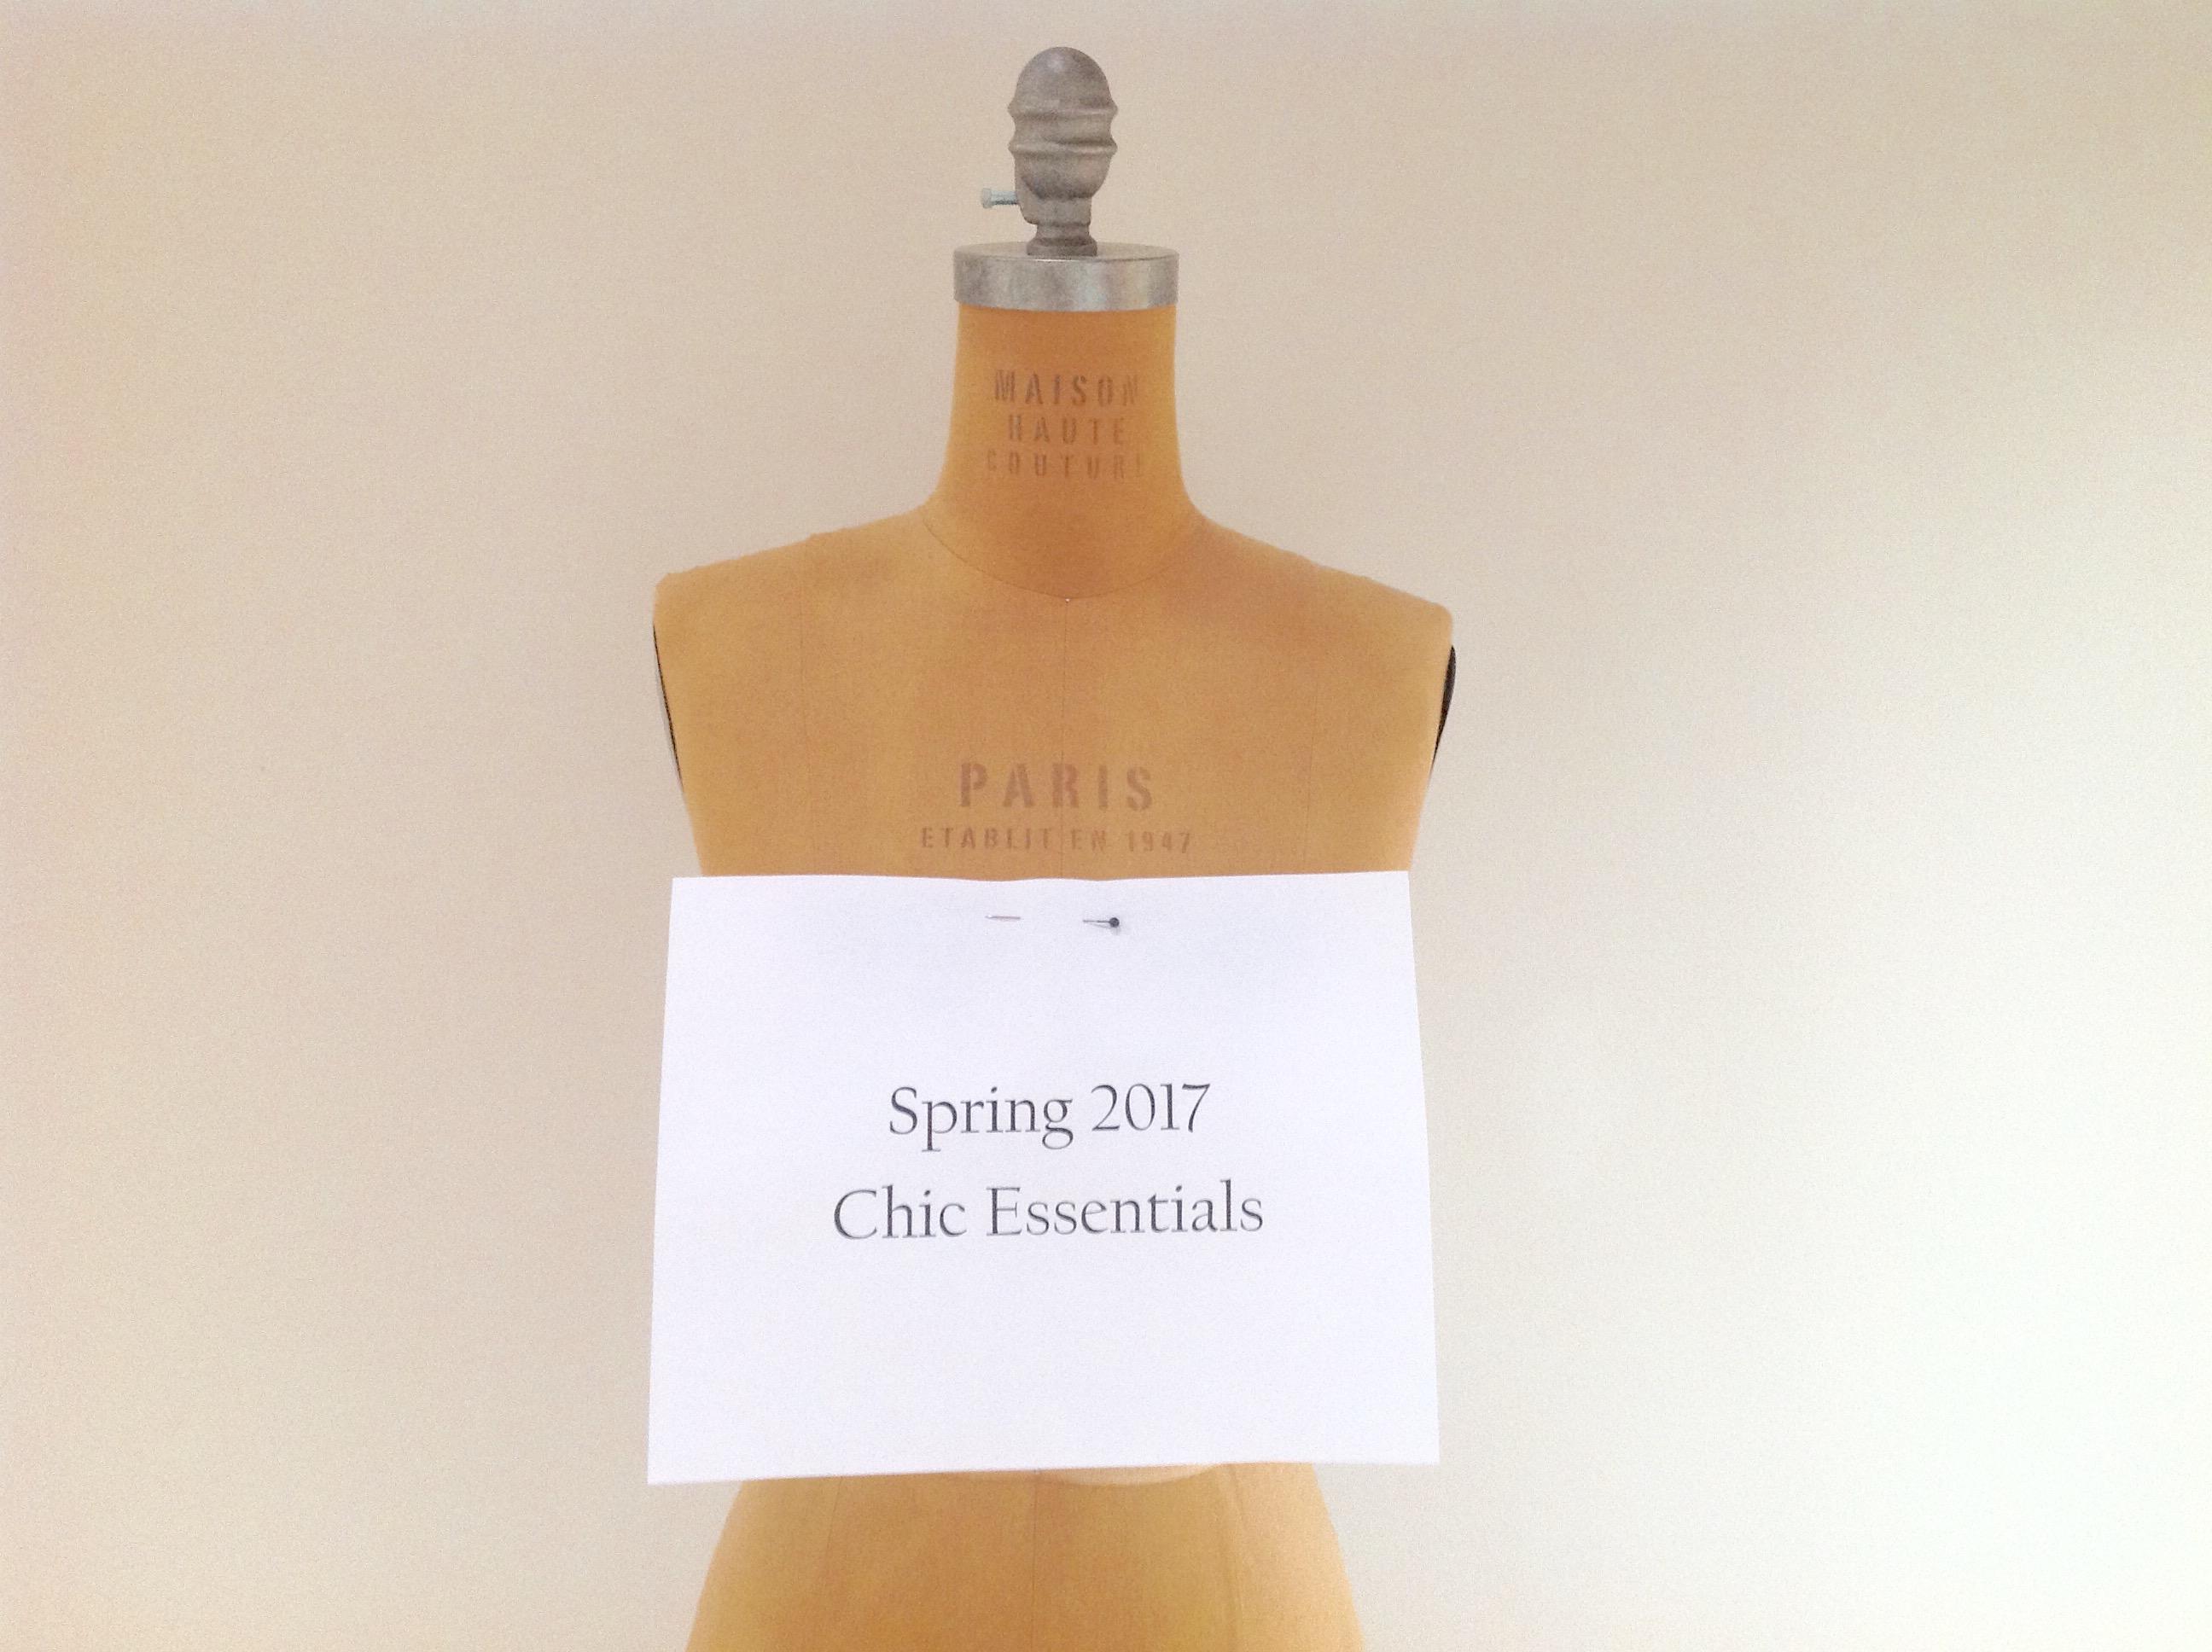 Spring 2017 Chic Essentials